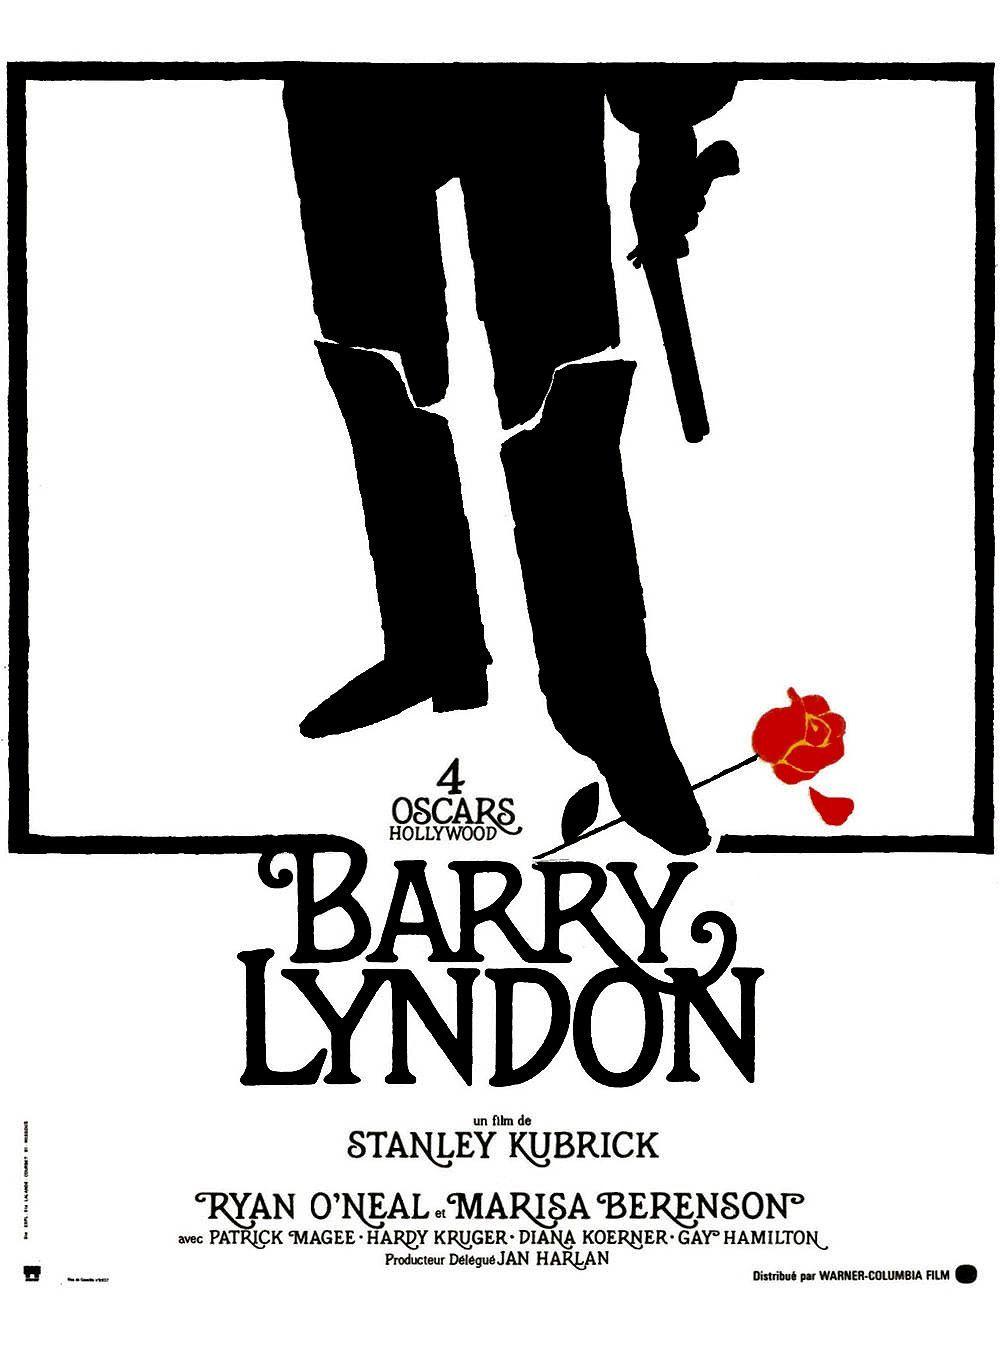 BARRY LYNDON de Stanley Kubrick